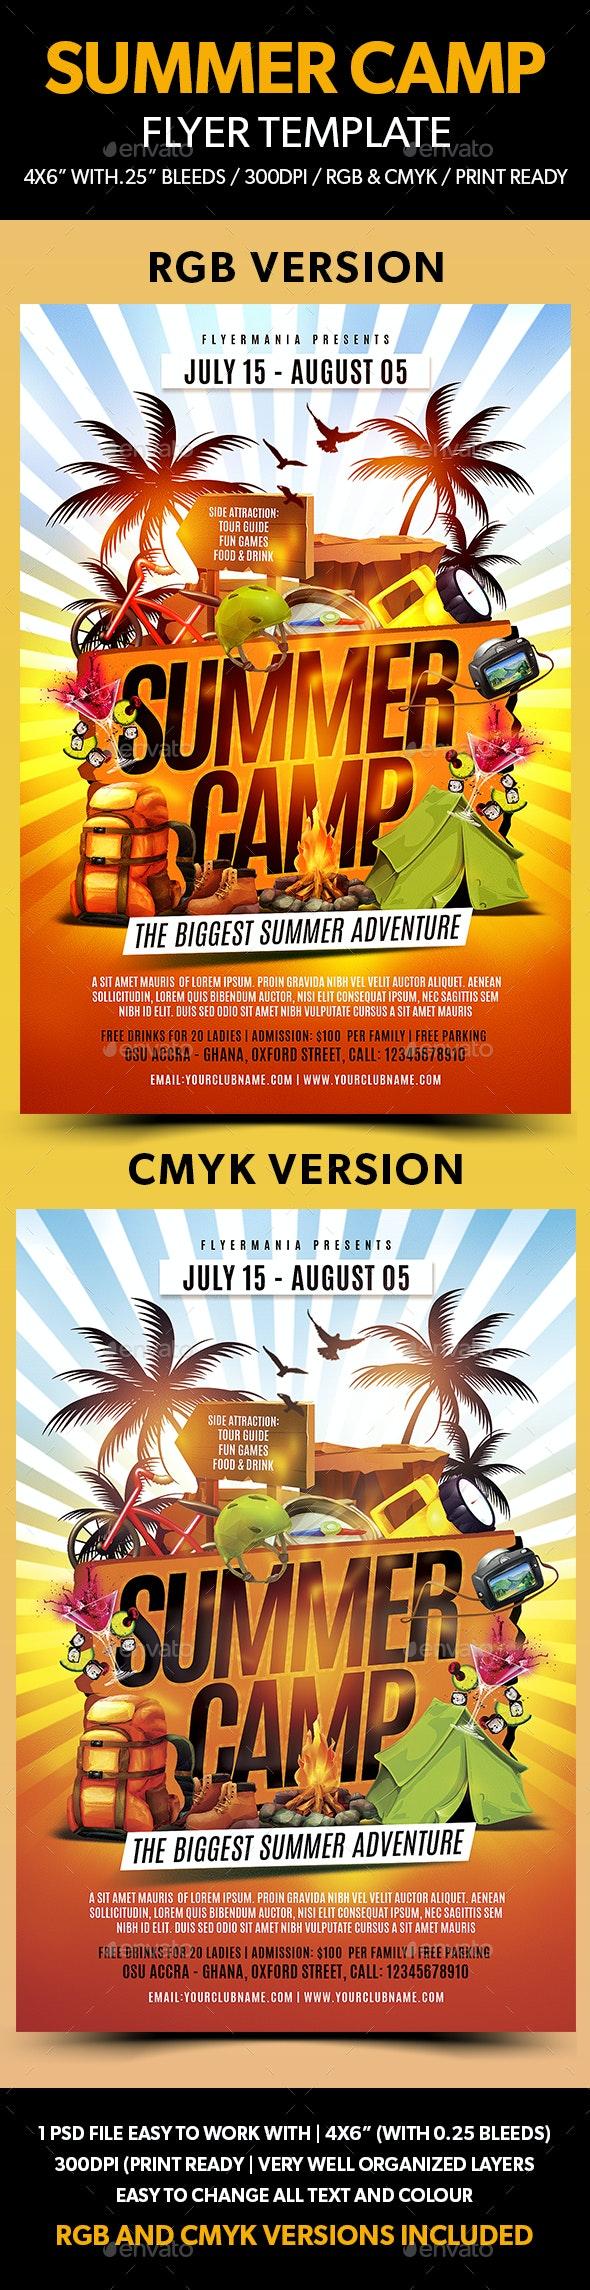 Summer Camp Flyer Template - Flyers Print Templates